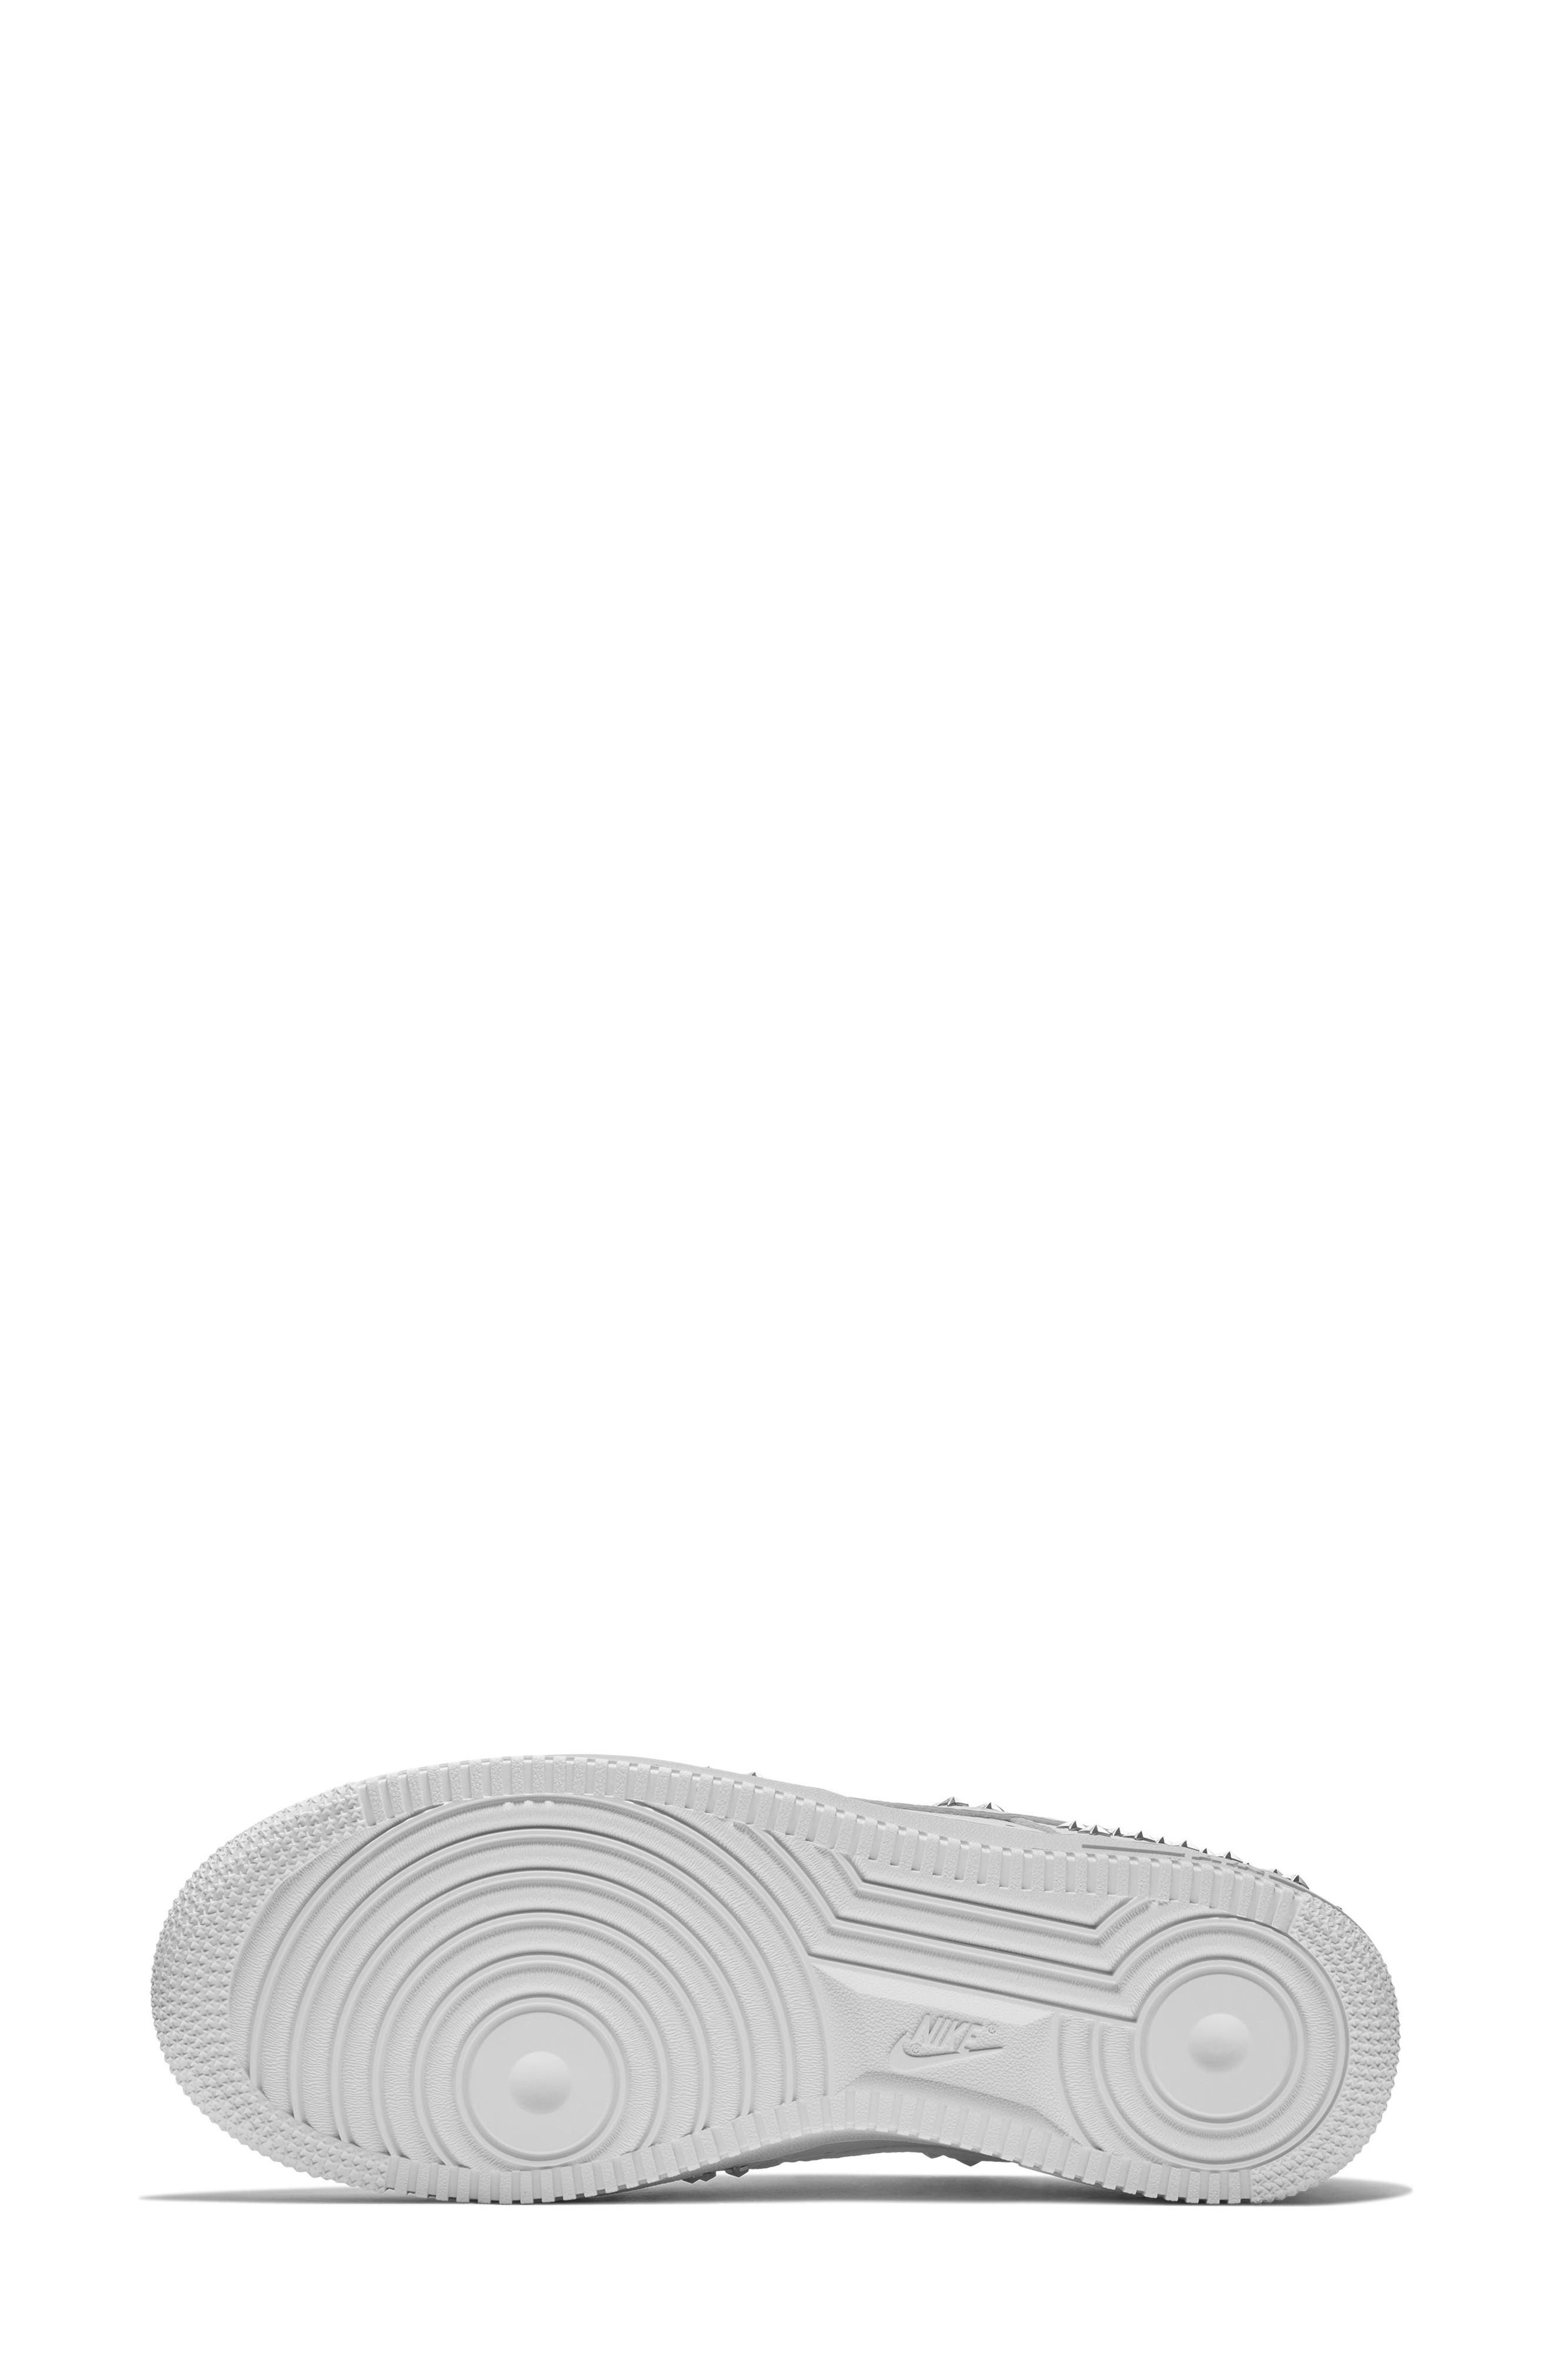 Air Force 1 '07 XX Sneaker,                             Alternate thumbnail 4, color,                             WHITE/ WHITE/ WHITE